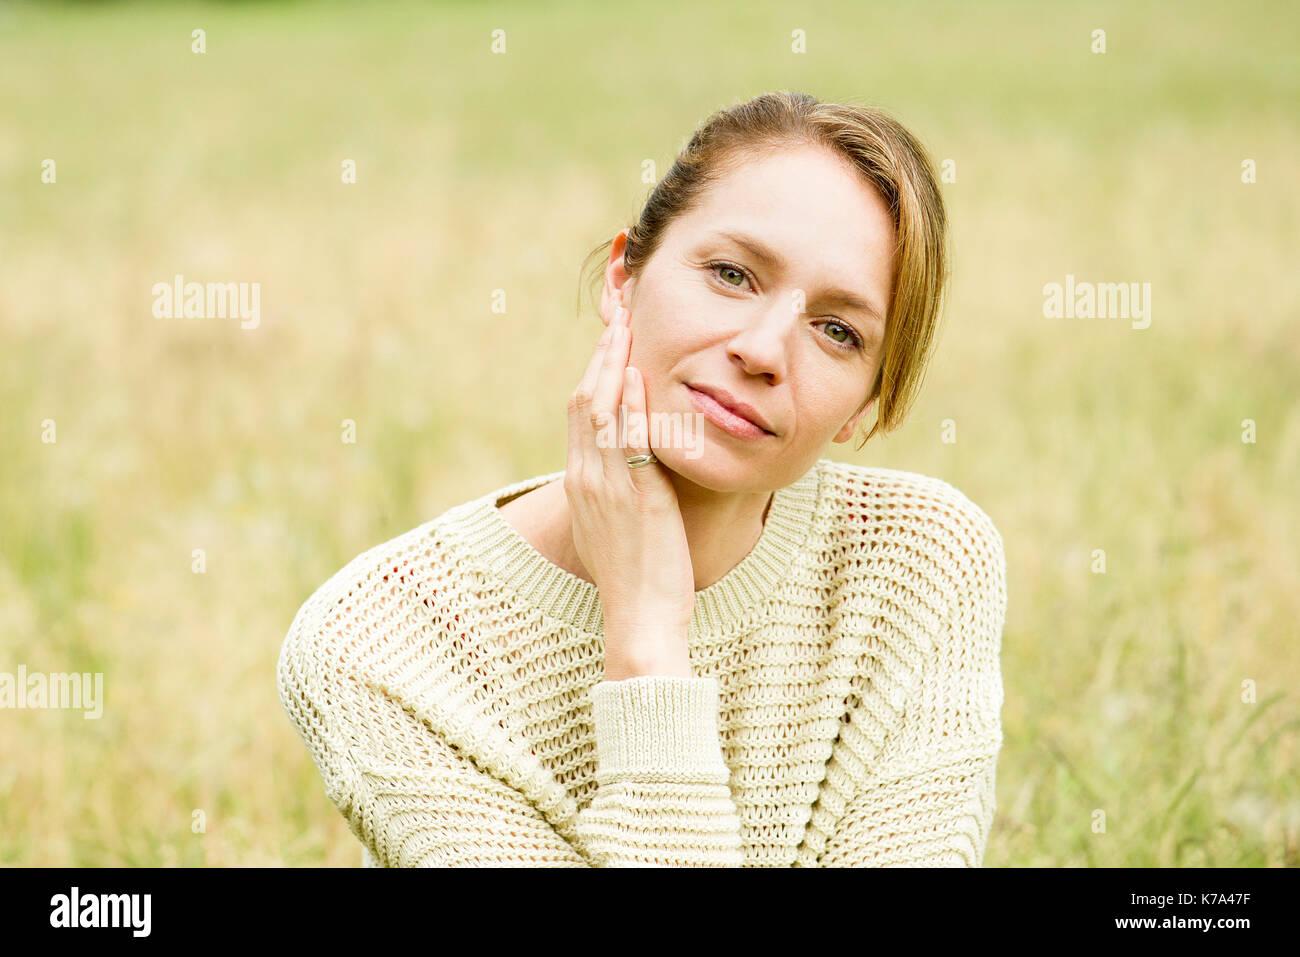 Woman contemplating, portrait - Stock Image